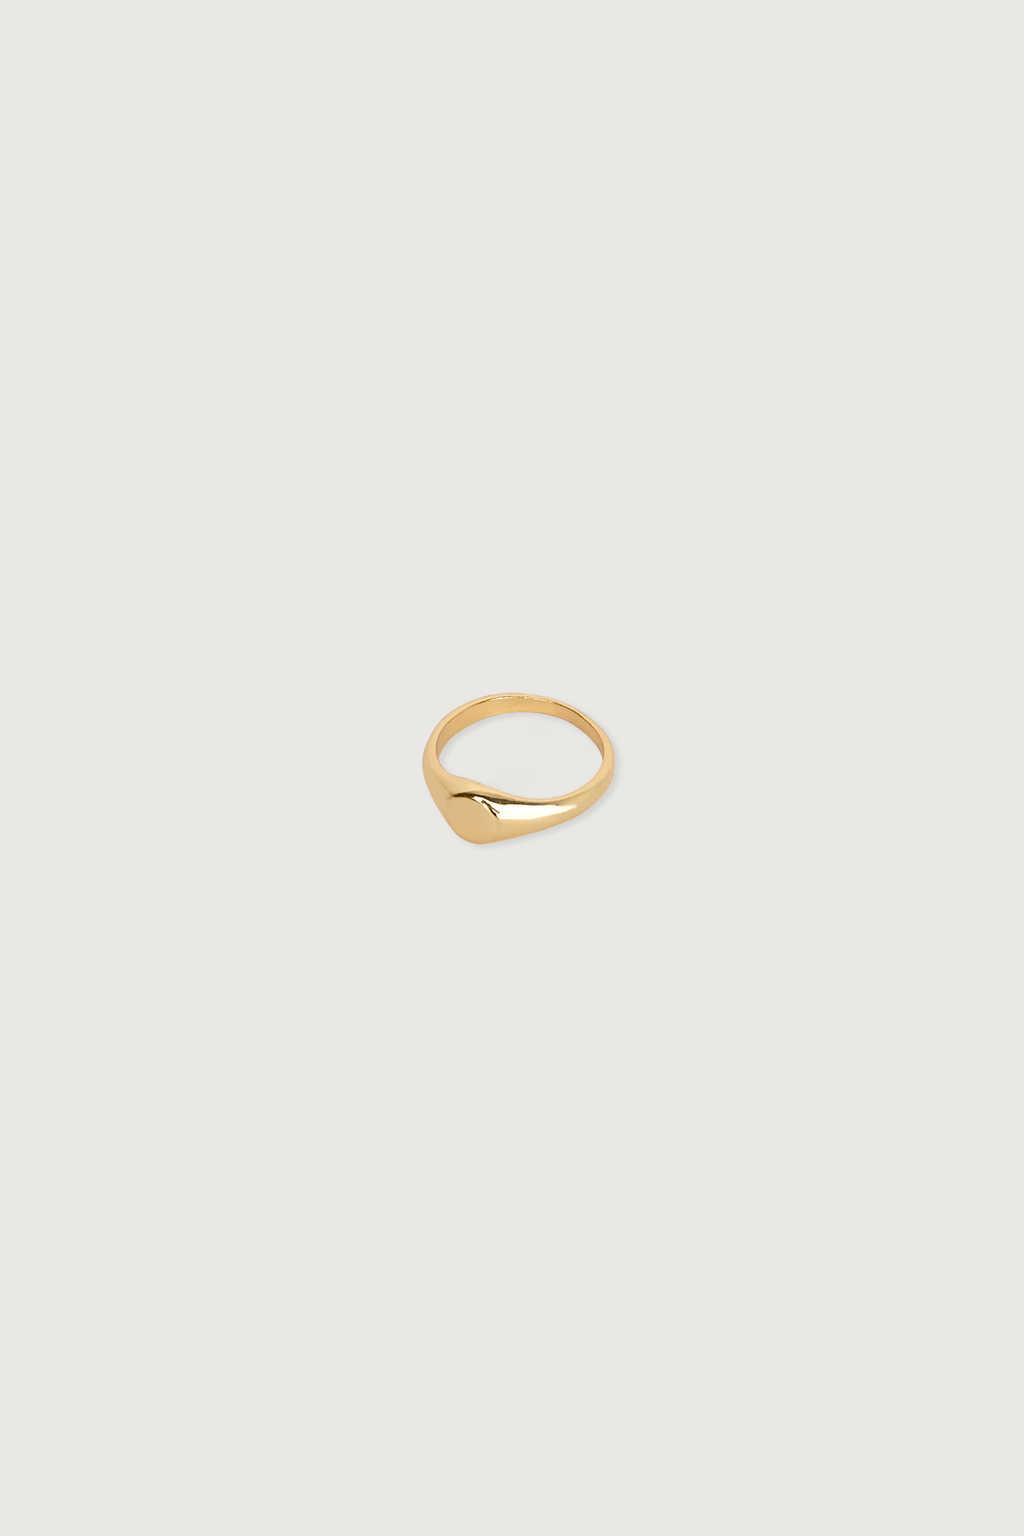 Ring 3413 Gold 1